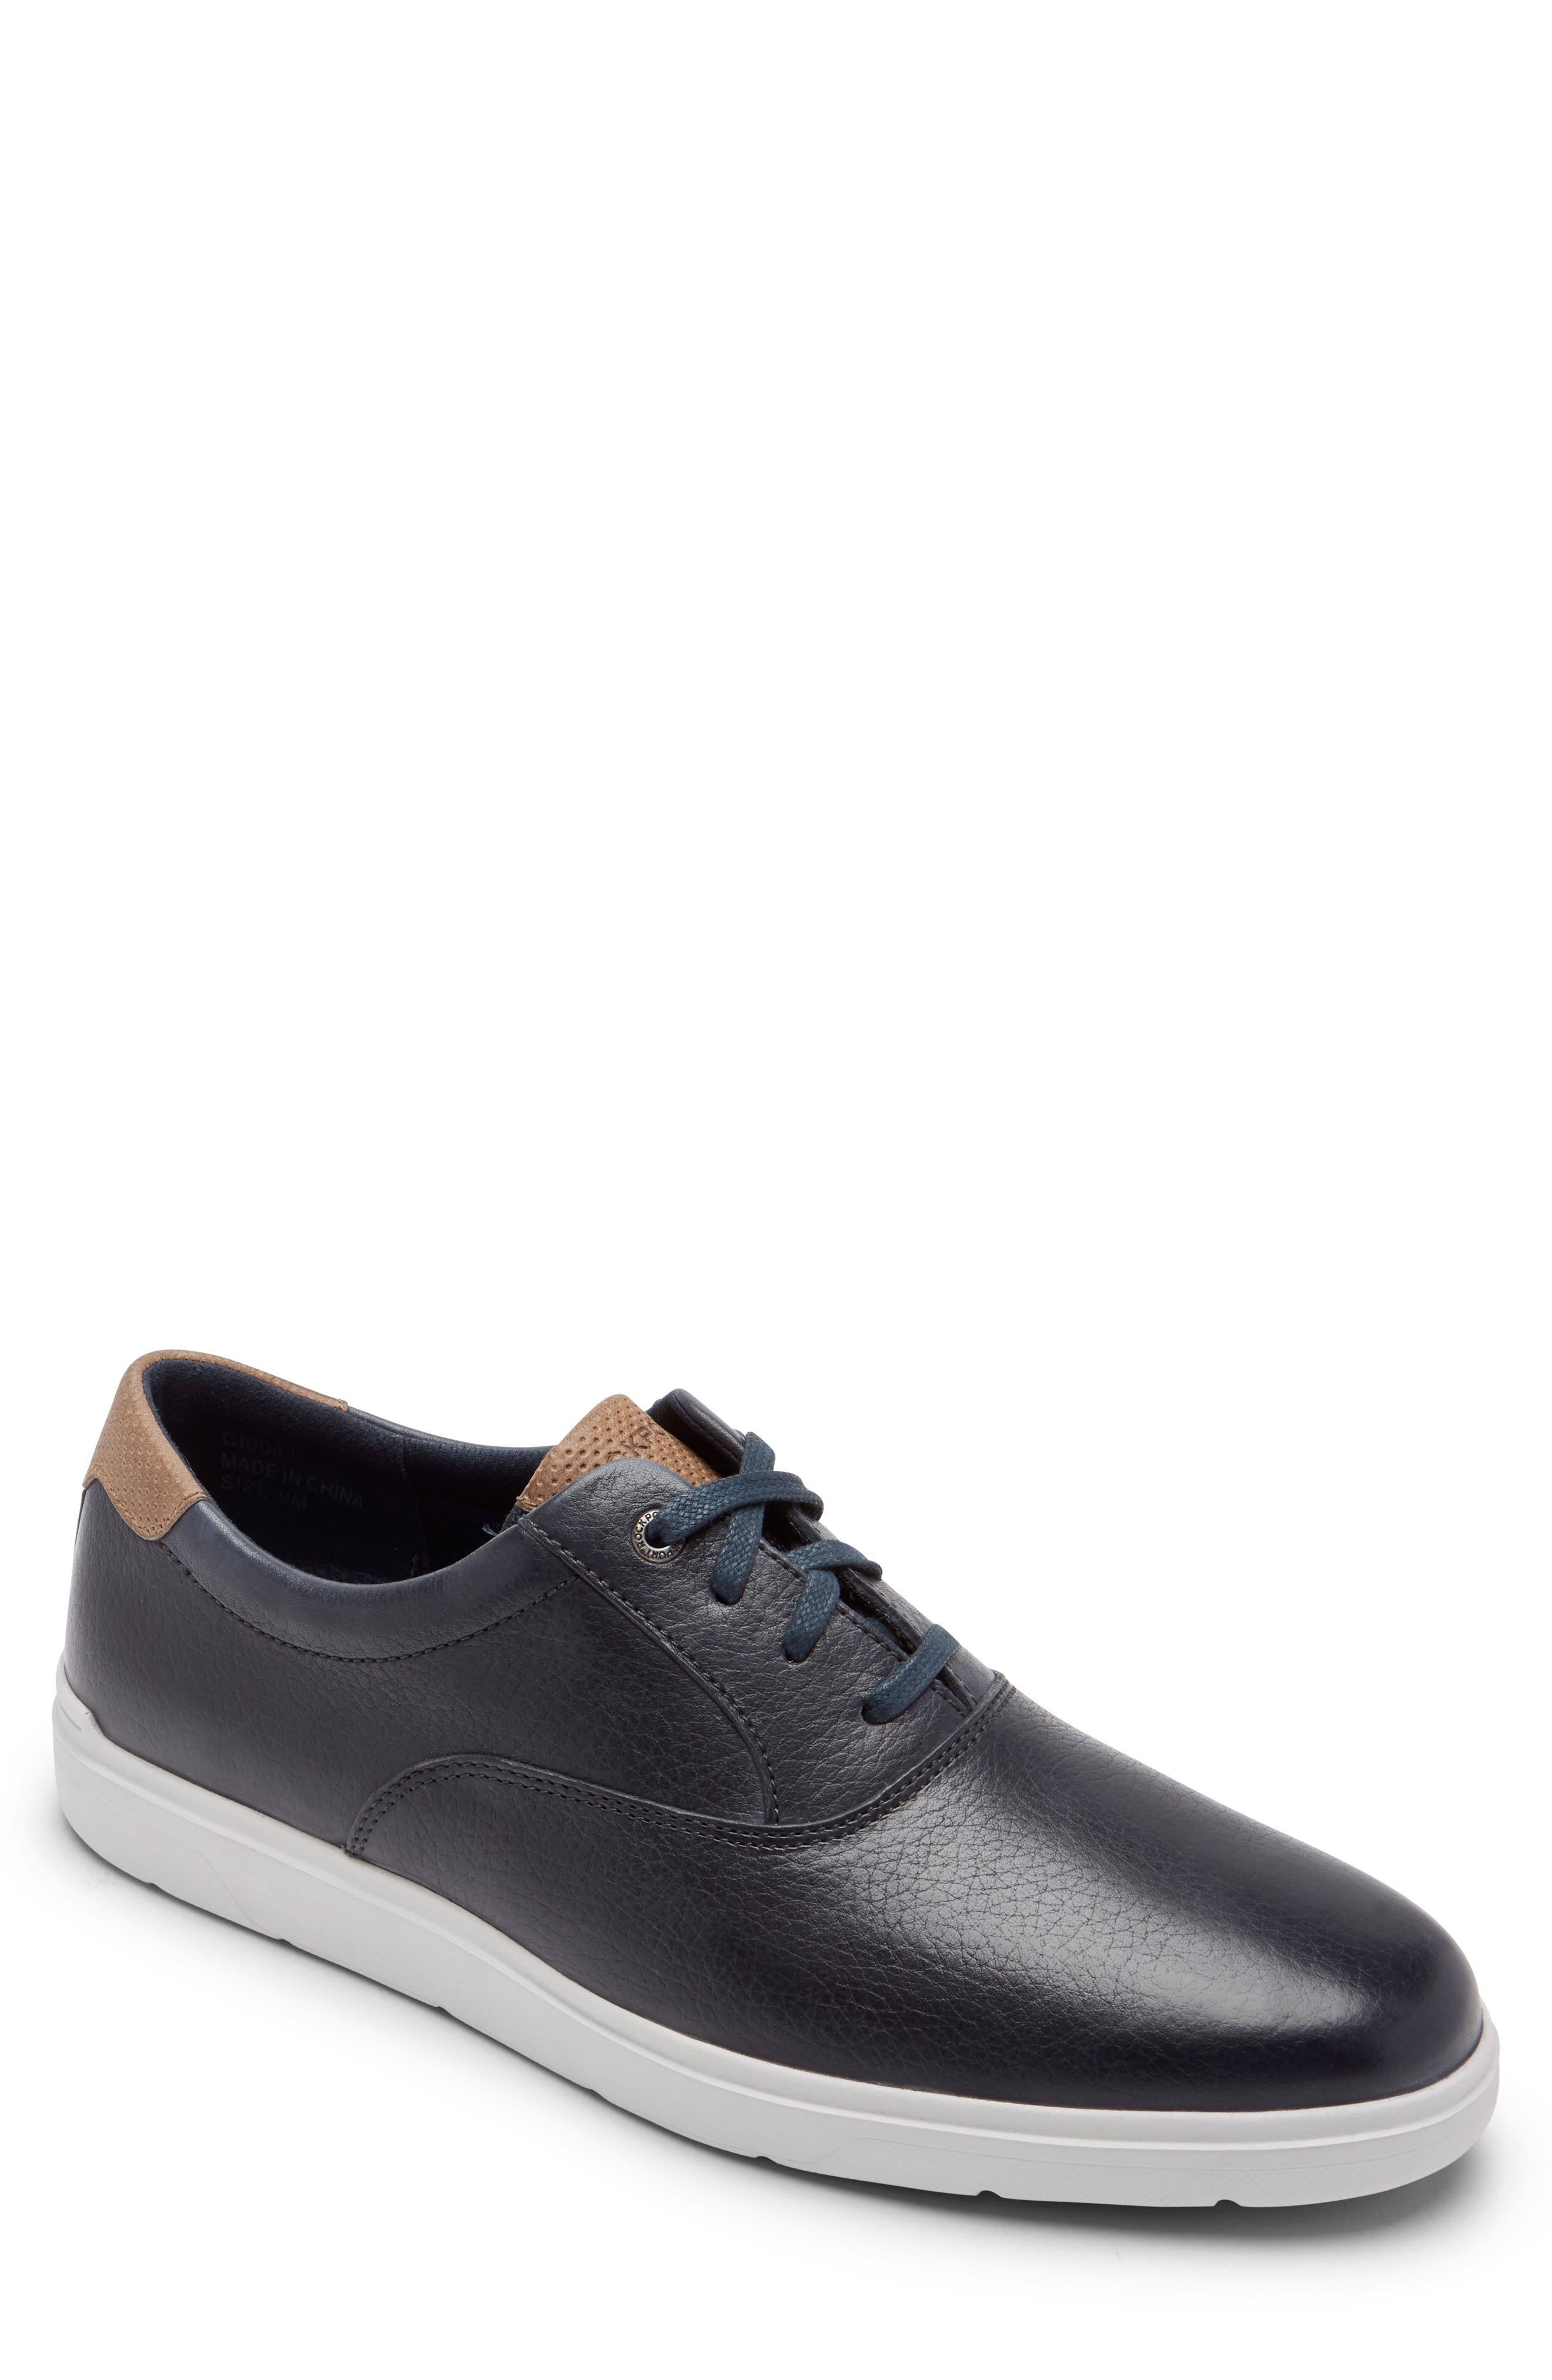 Image of Rockport Total Motion Lite Oxford Sneaker